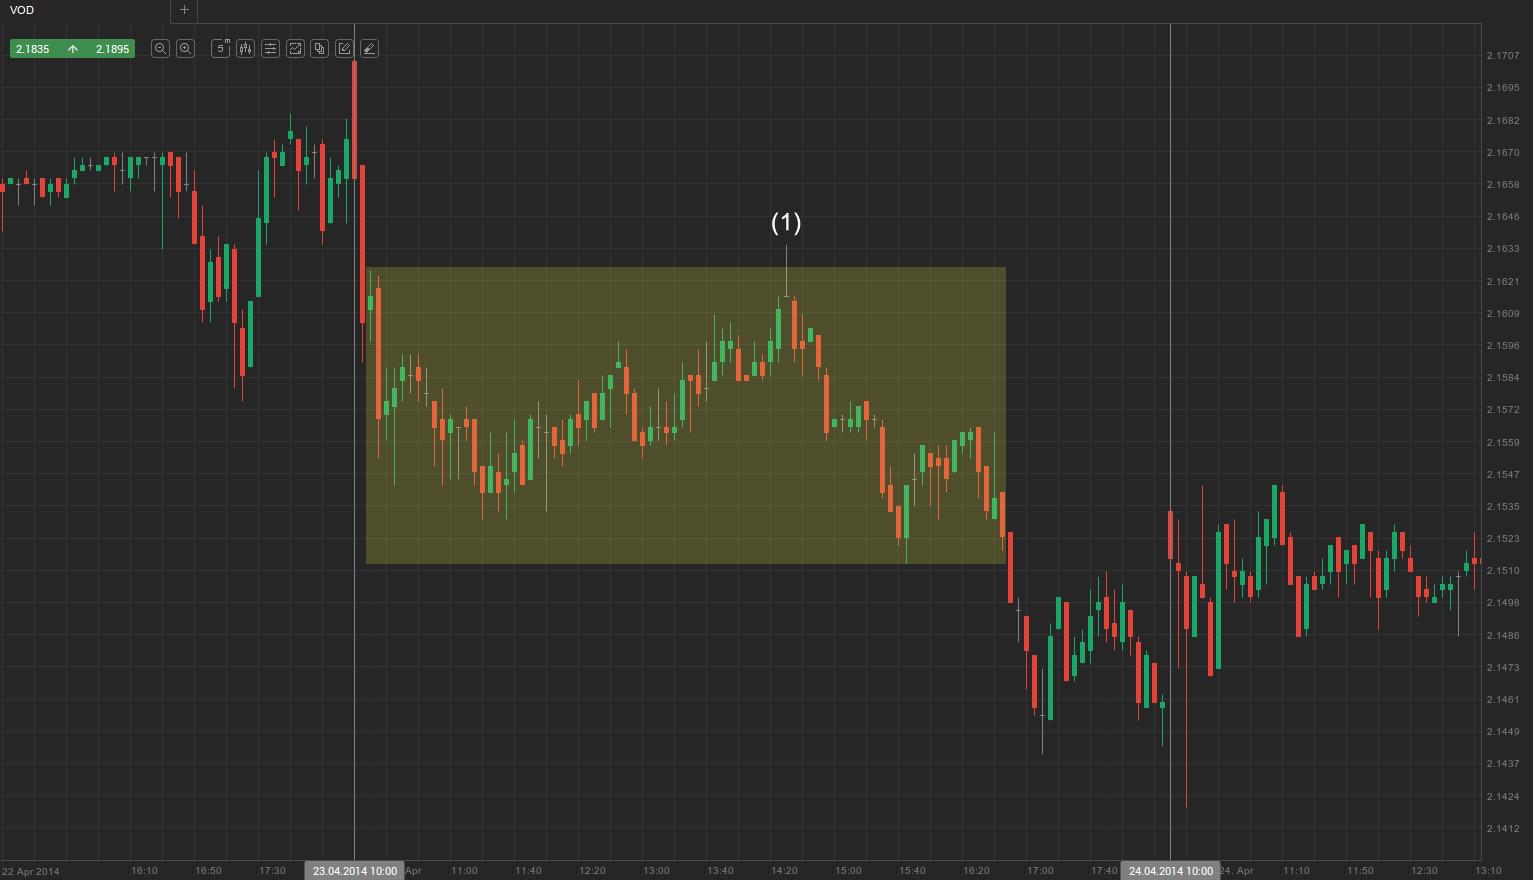 2. Late breakout + trading range